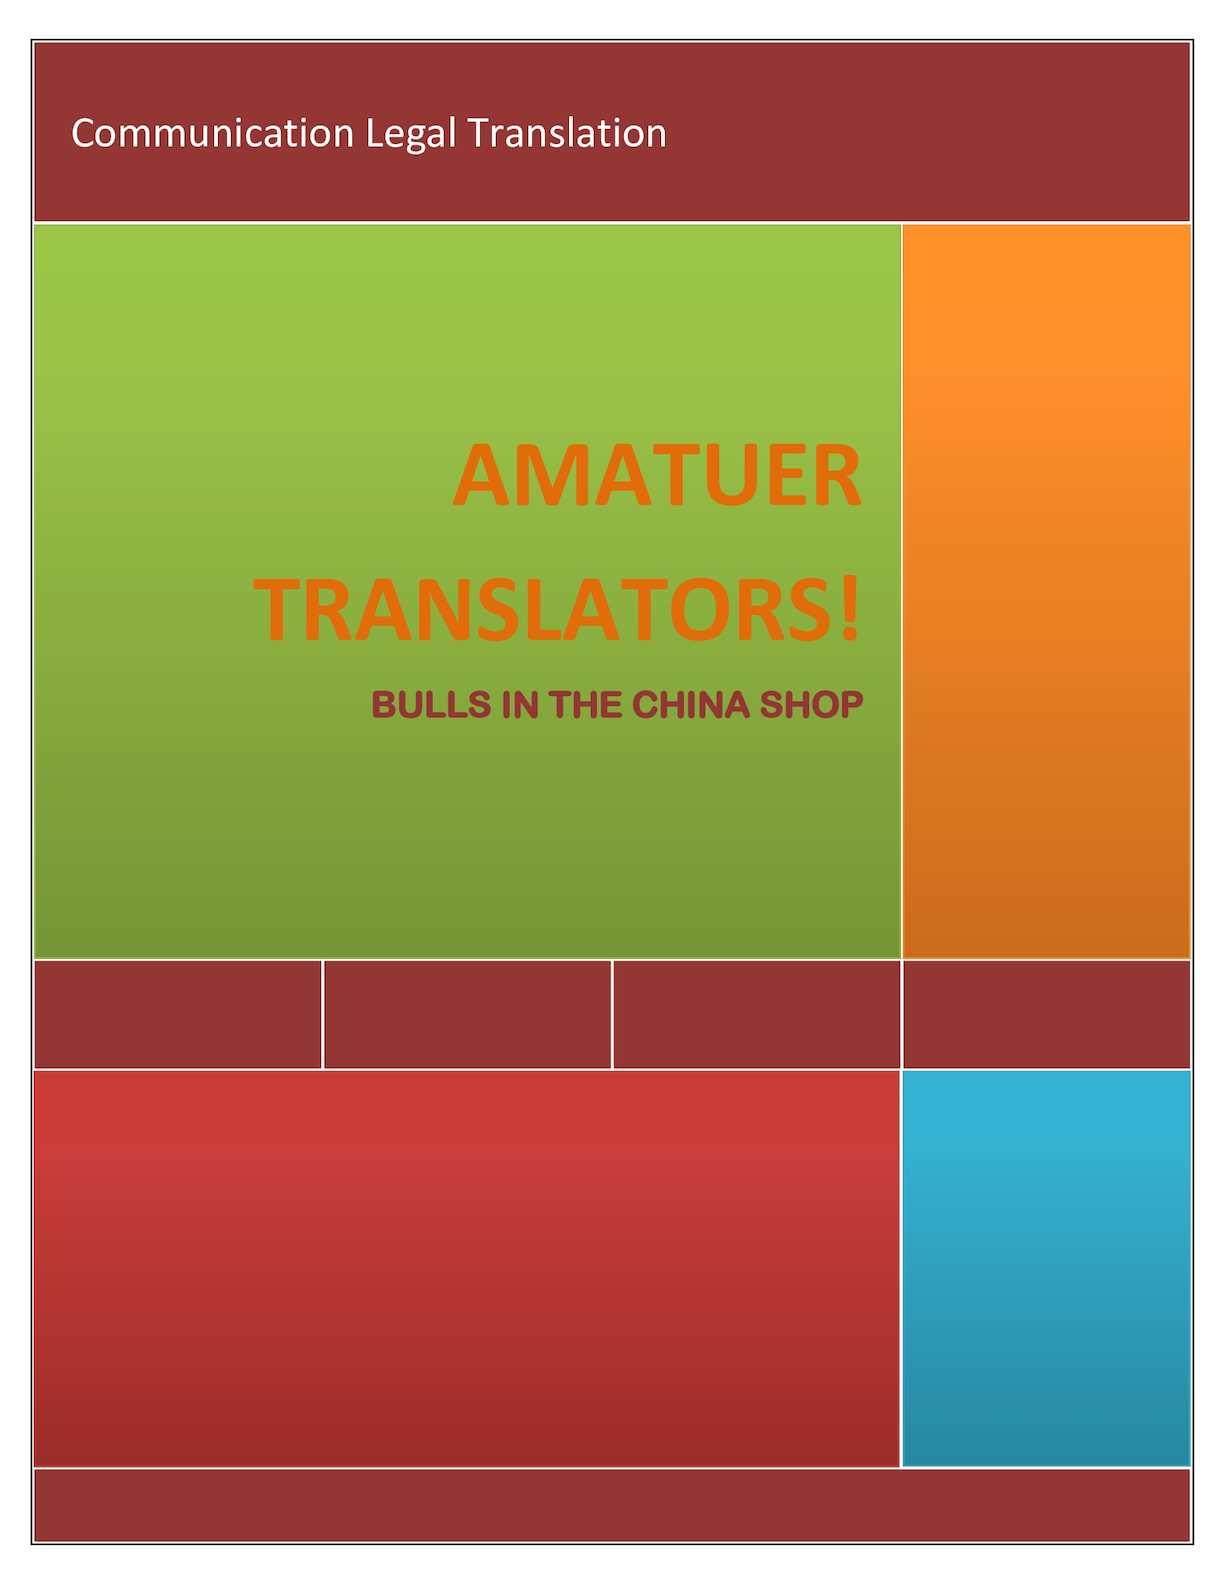 AMATUER TRANSLATORS